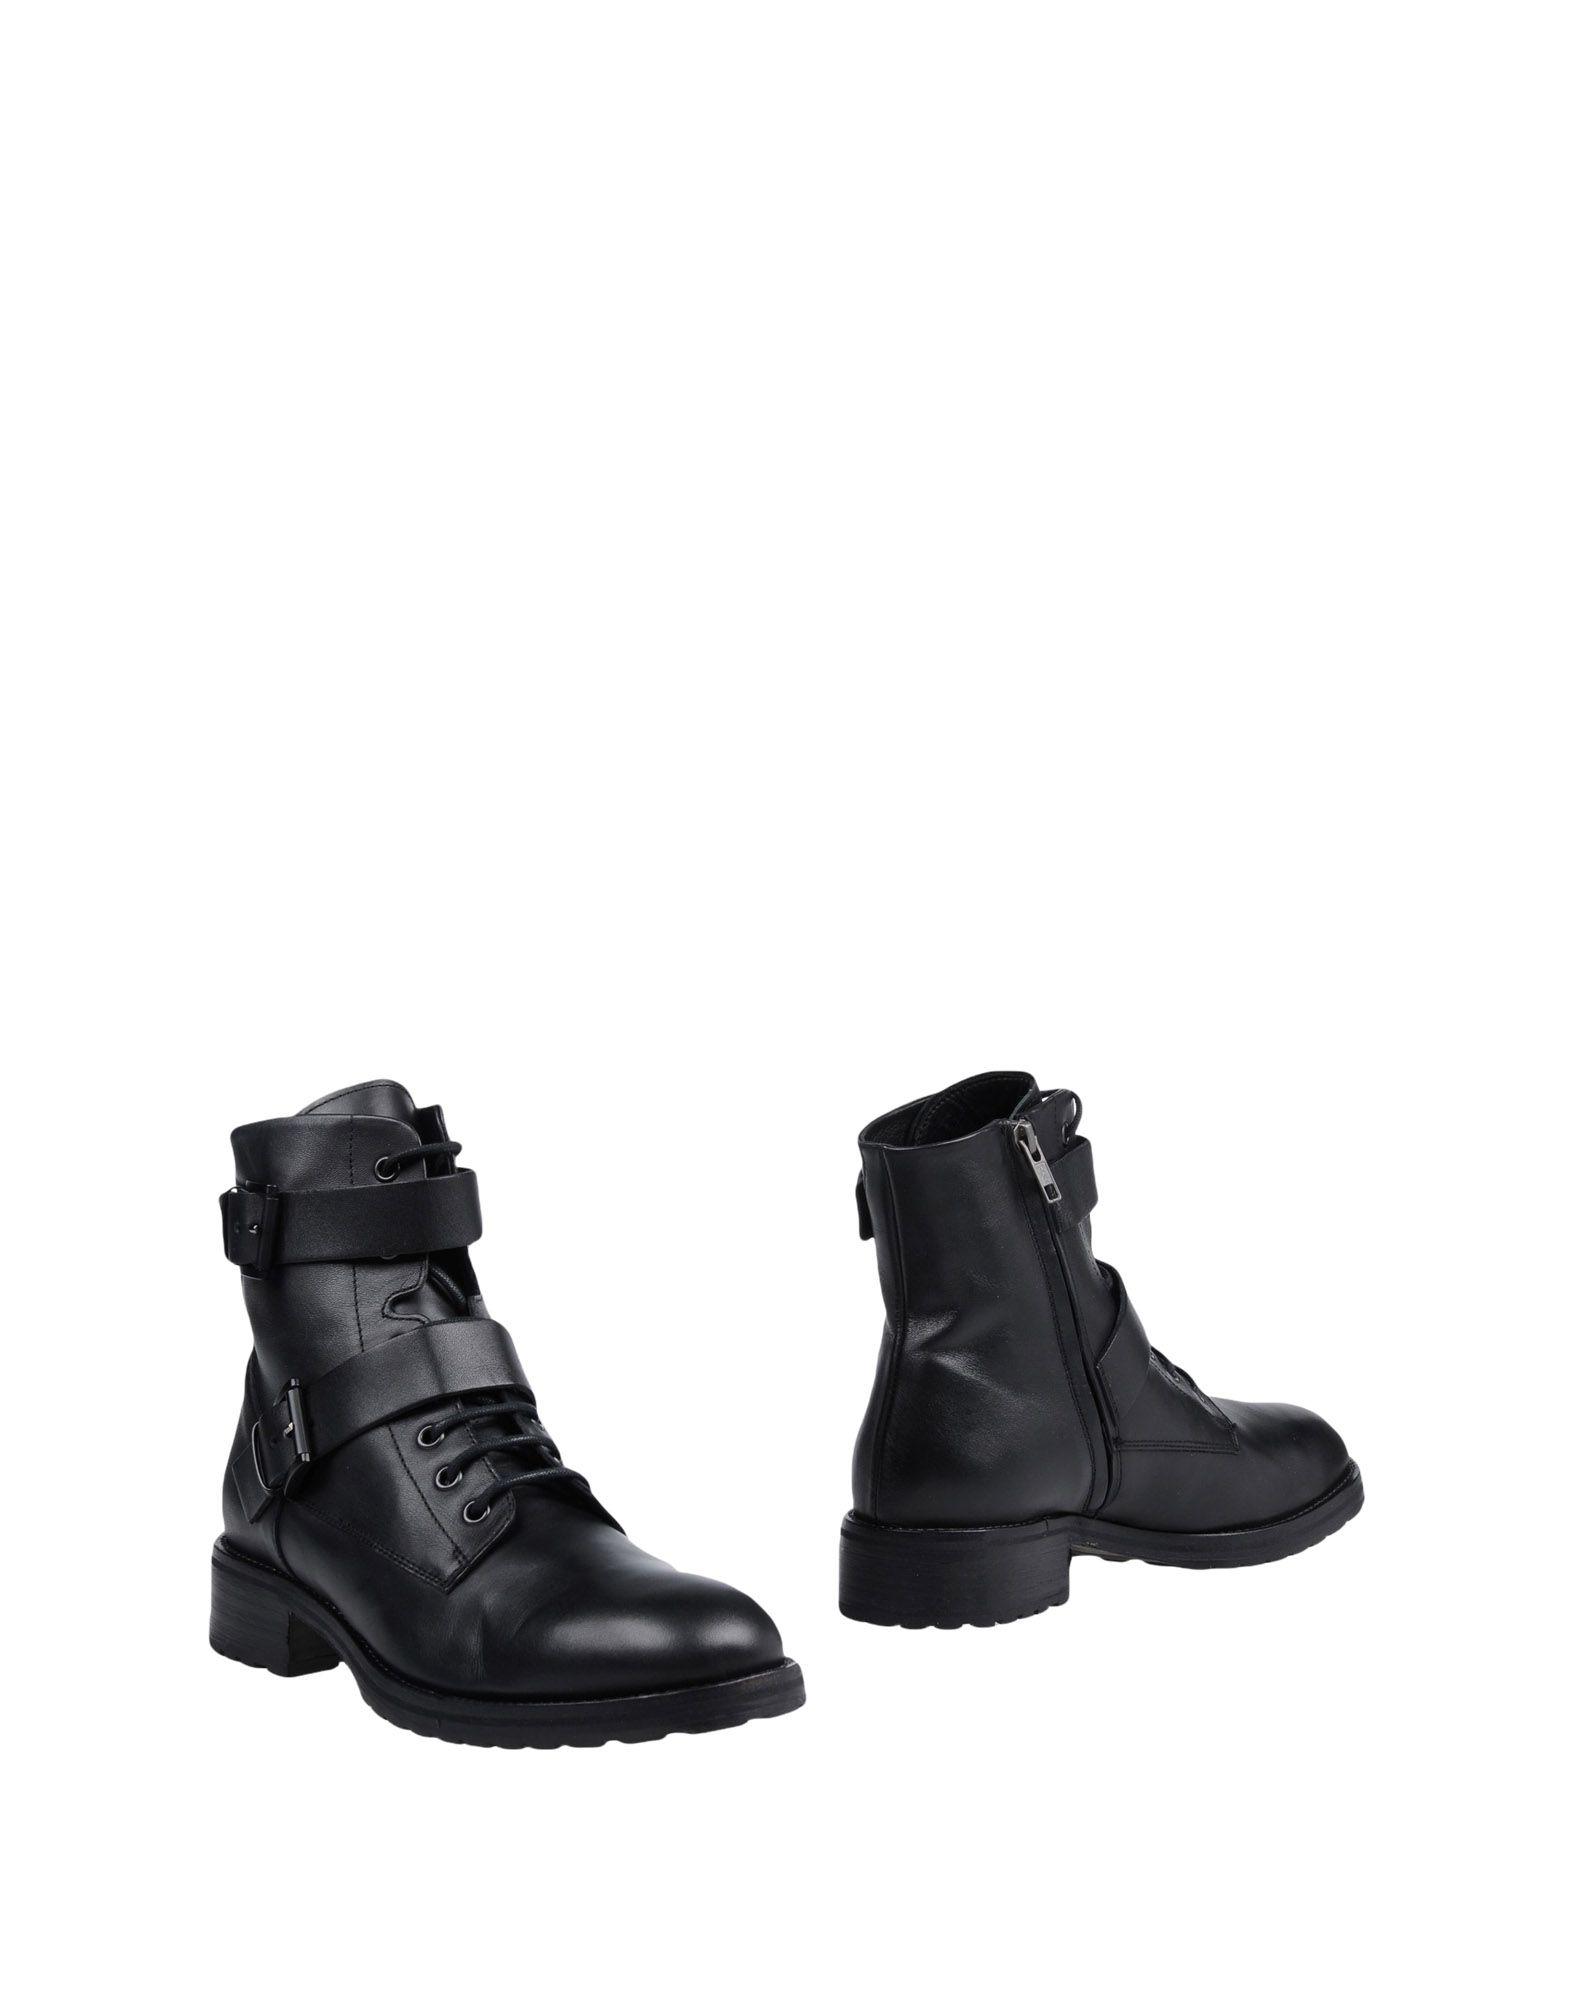 LEMARÉ Полусапоги и высокие ботинки magazzini del sale полусапоги и высокие ботинки